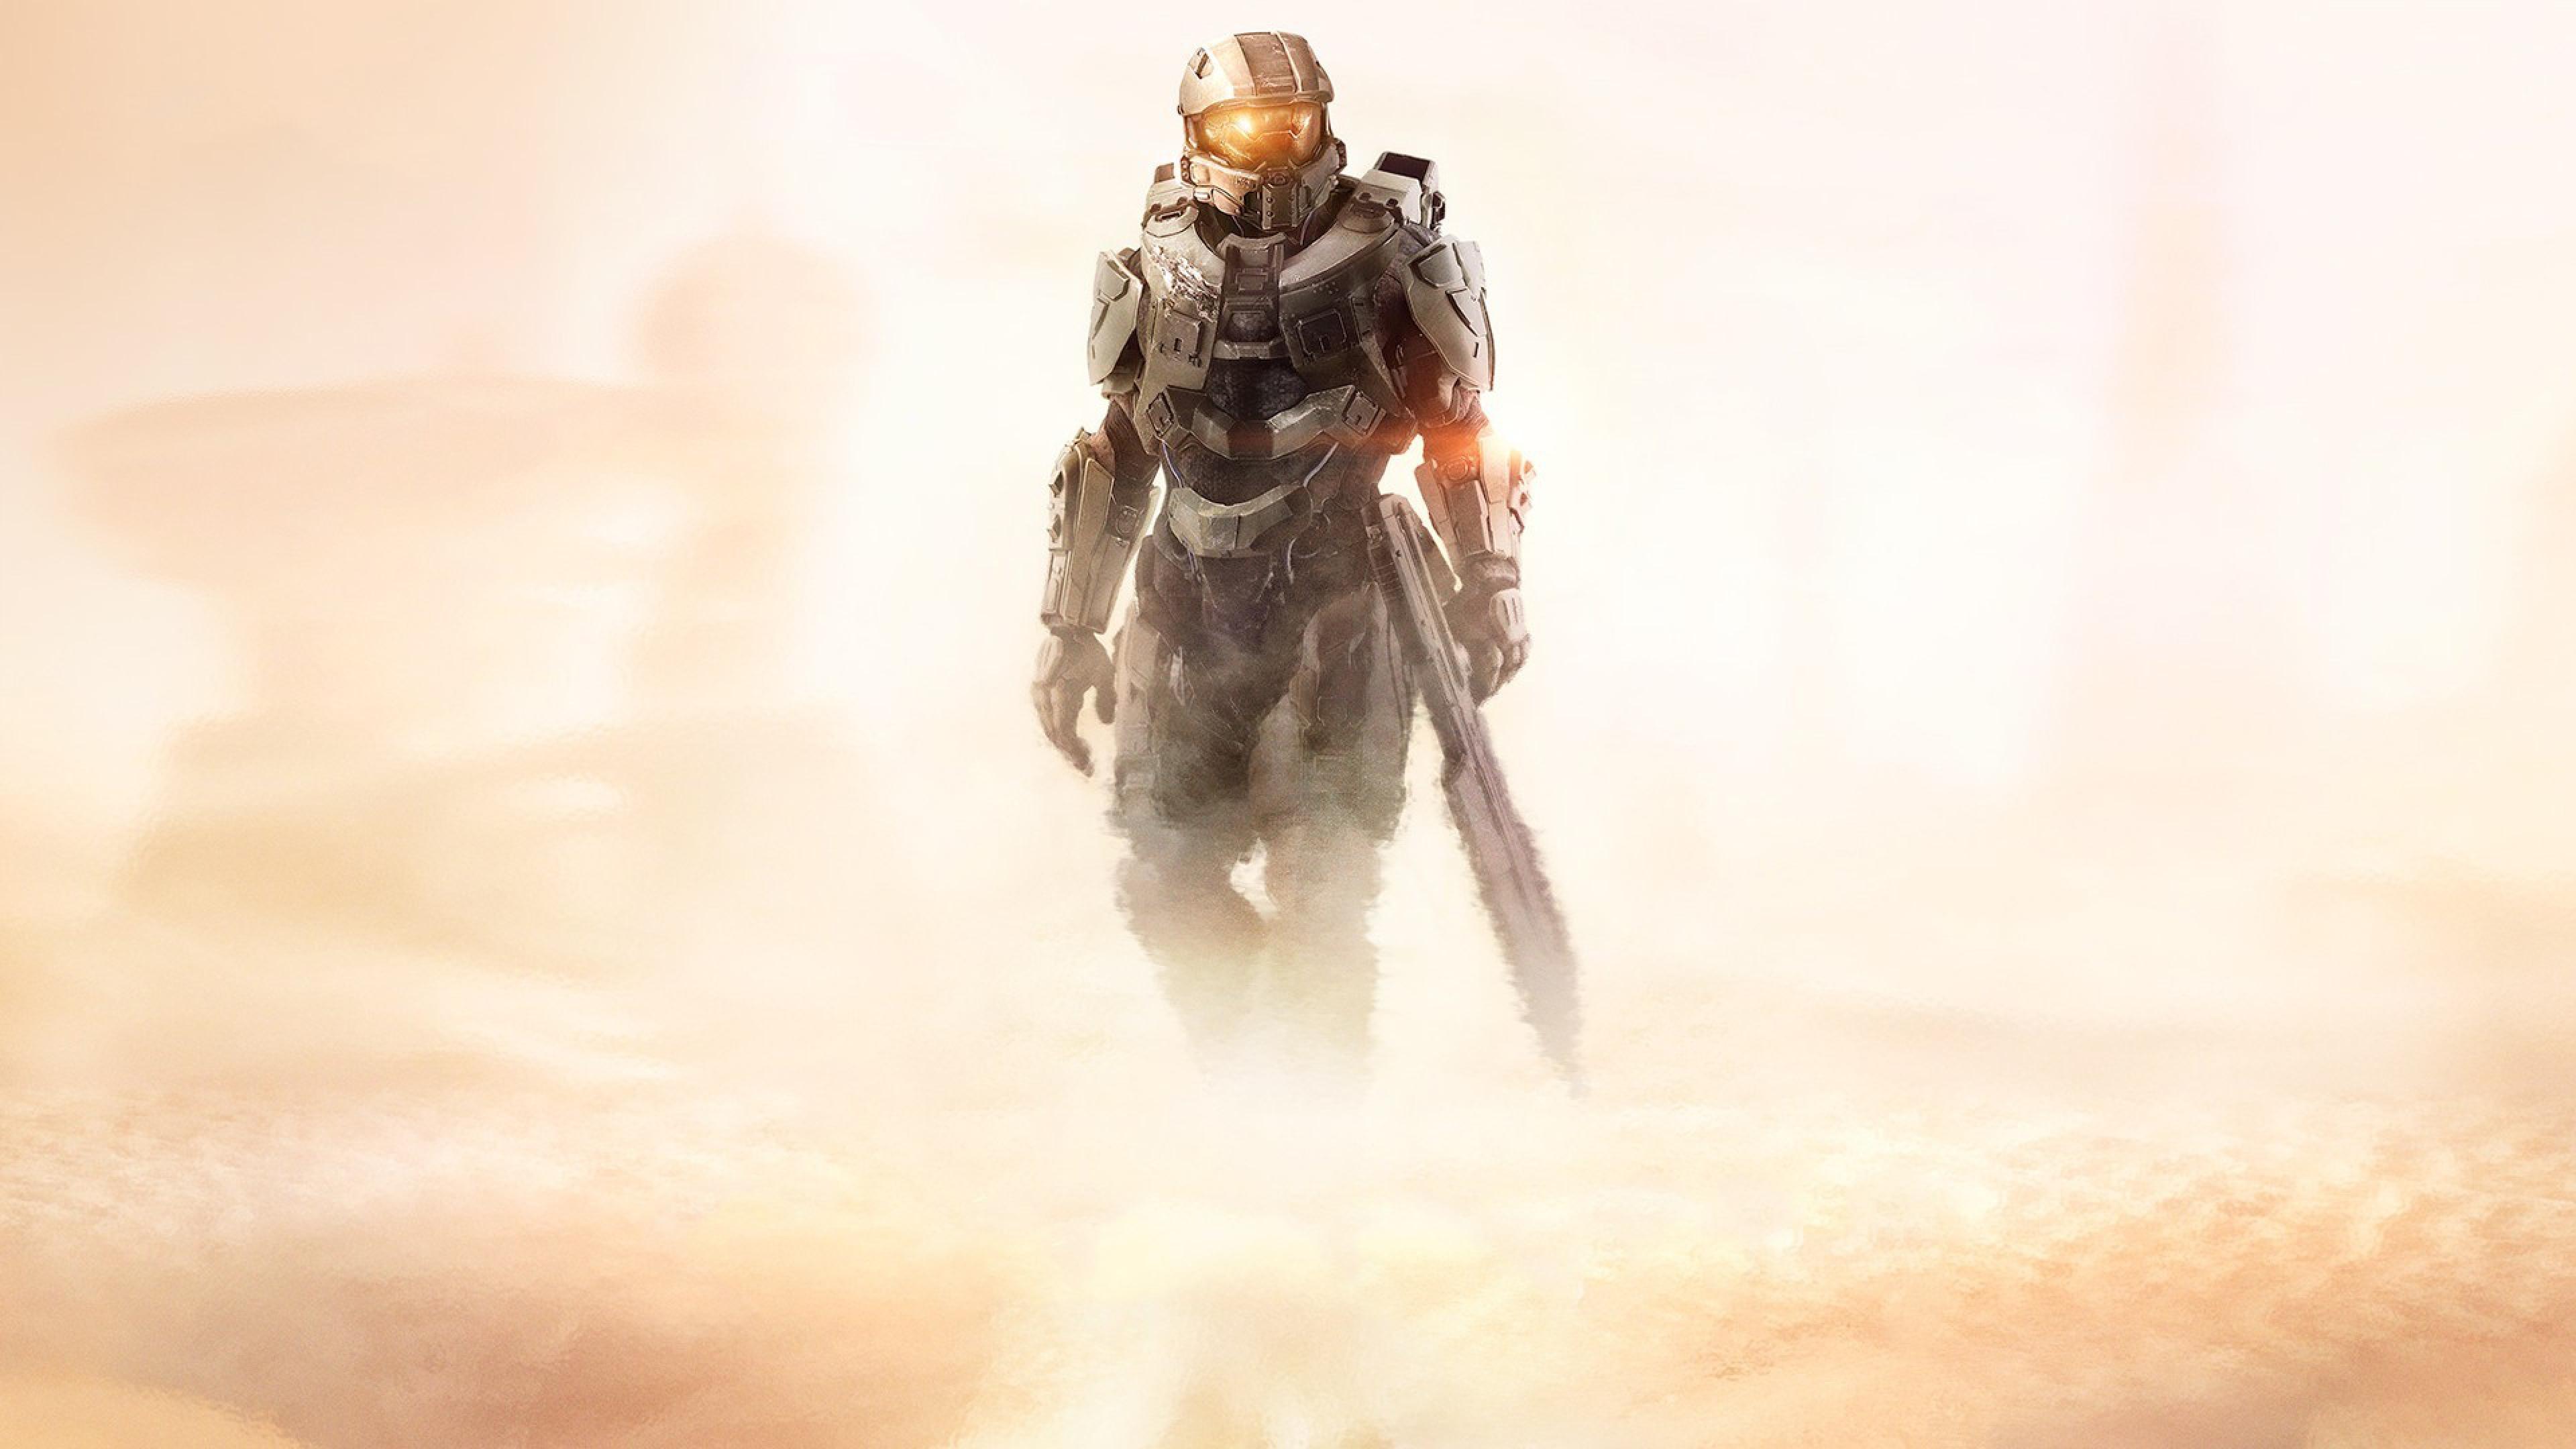 Halo 5 Guardians Master Chief John Halo Game Desert WallpapersByte com 3840x2160